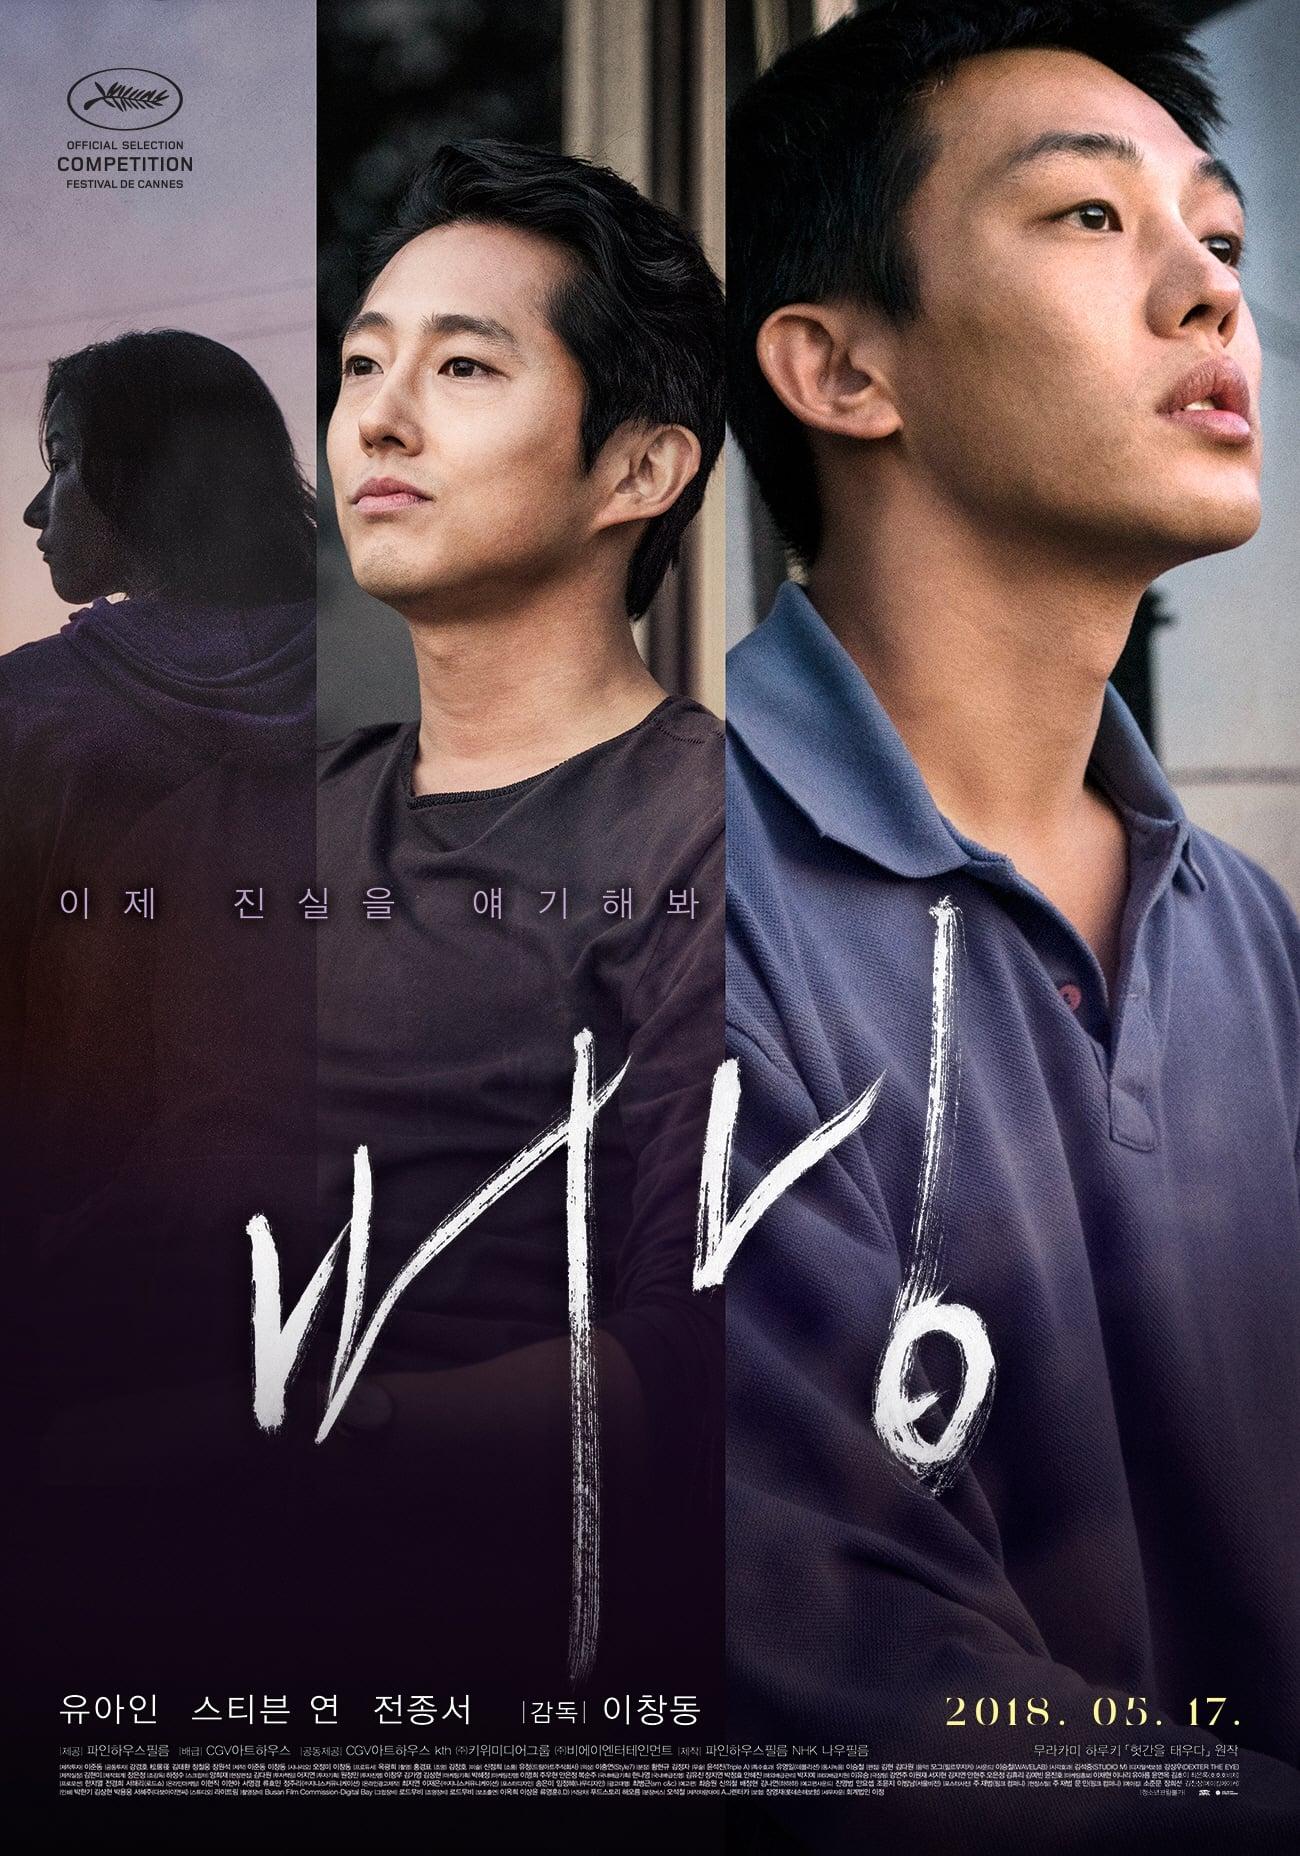 Poster and image movie Film Burning - Burning 2018